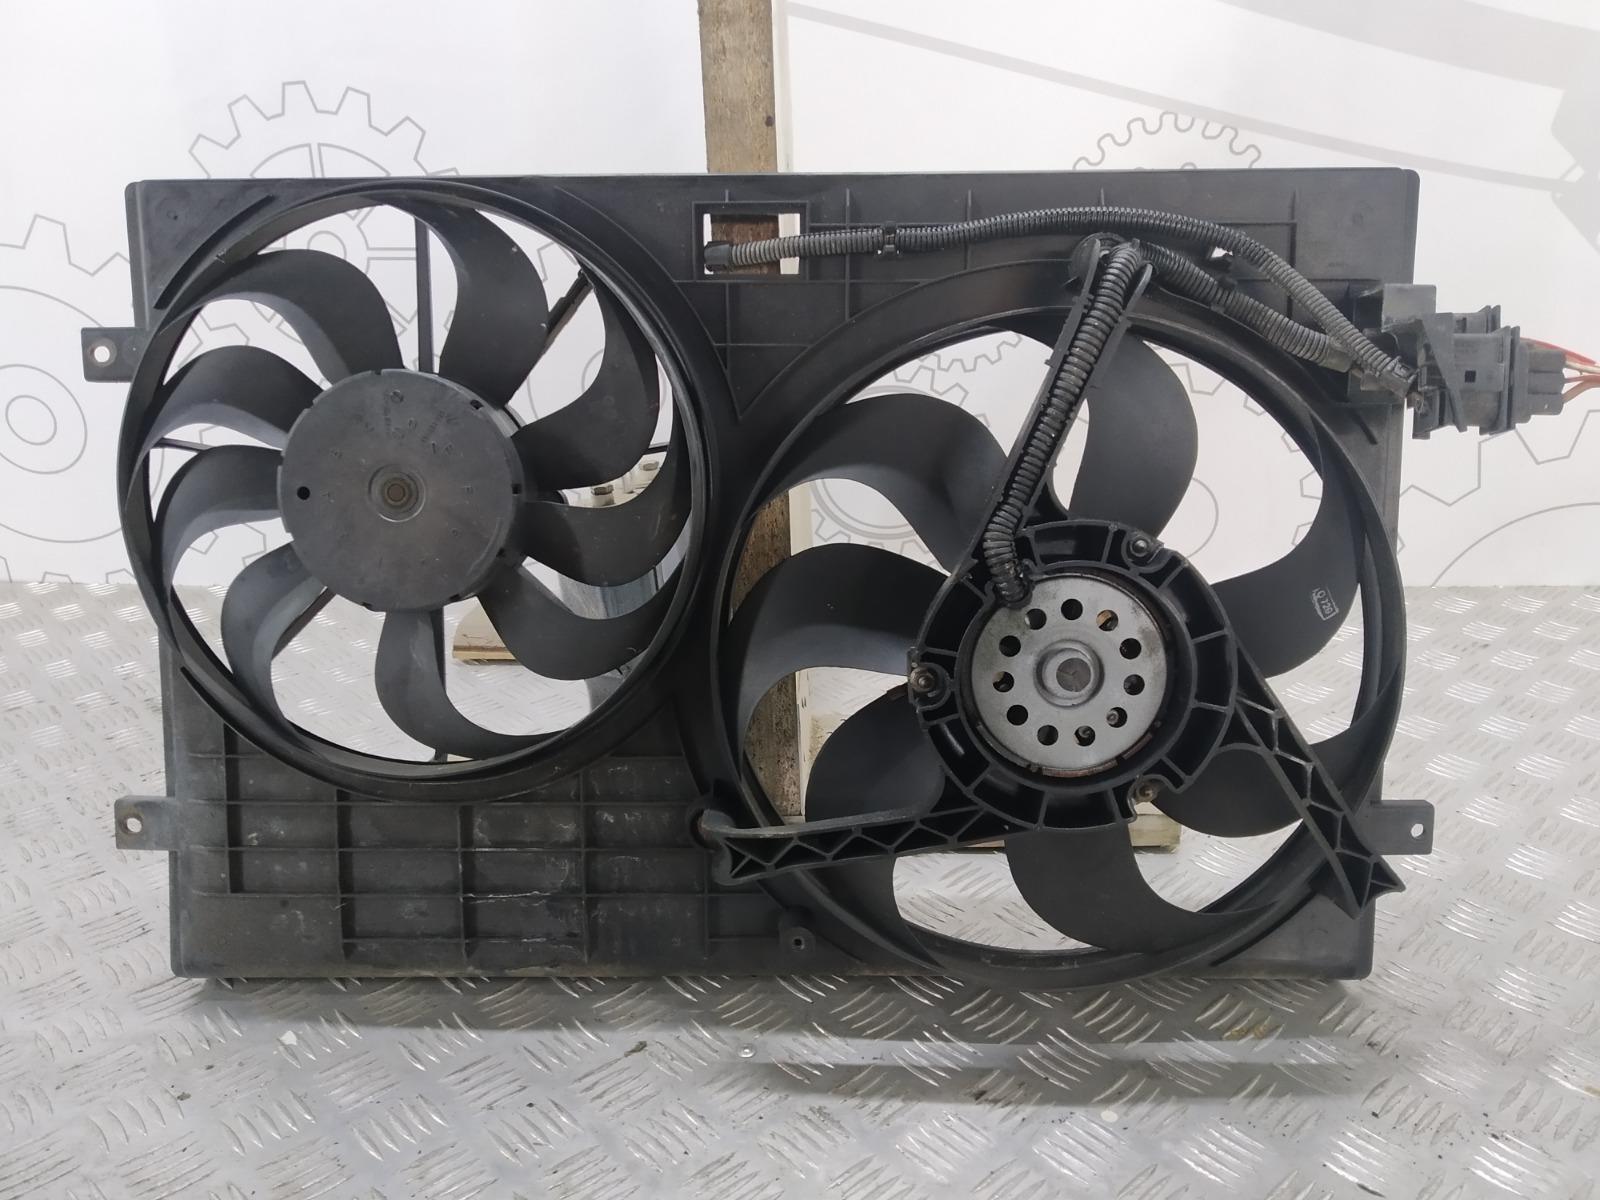 Вентилятор радиатора Skoda Fabia 1.4 I 2001 (б/у)